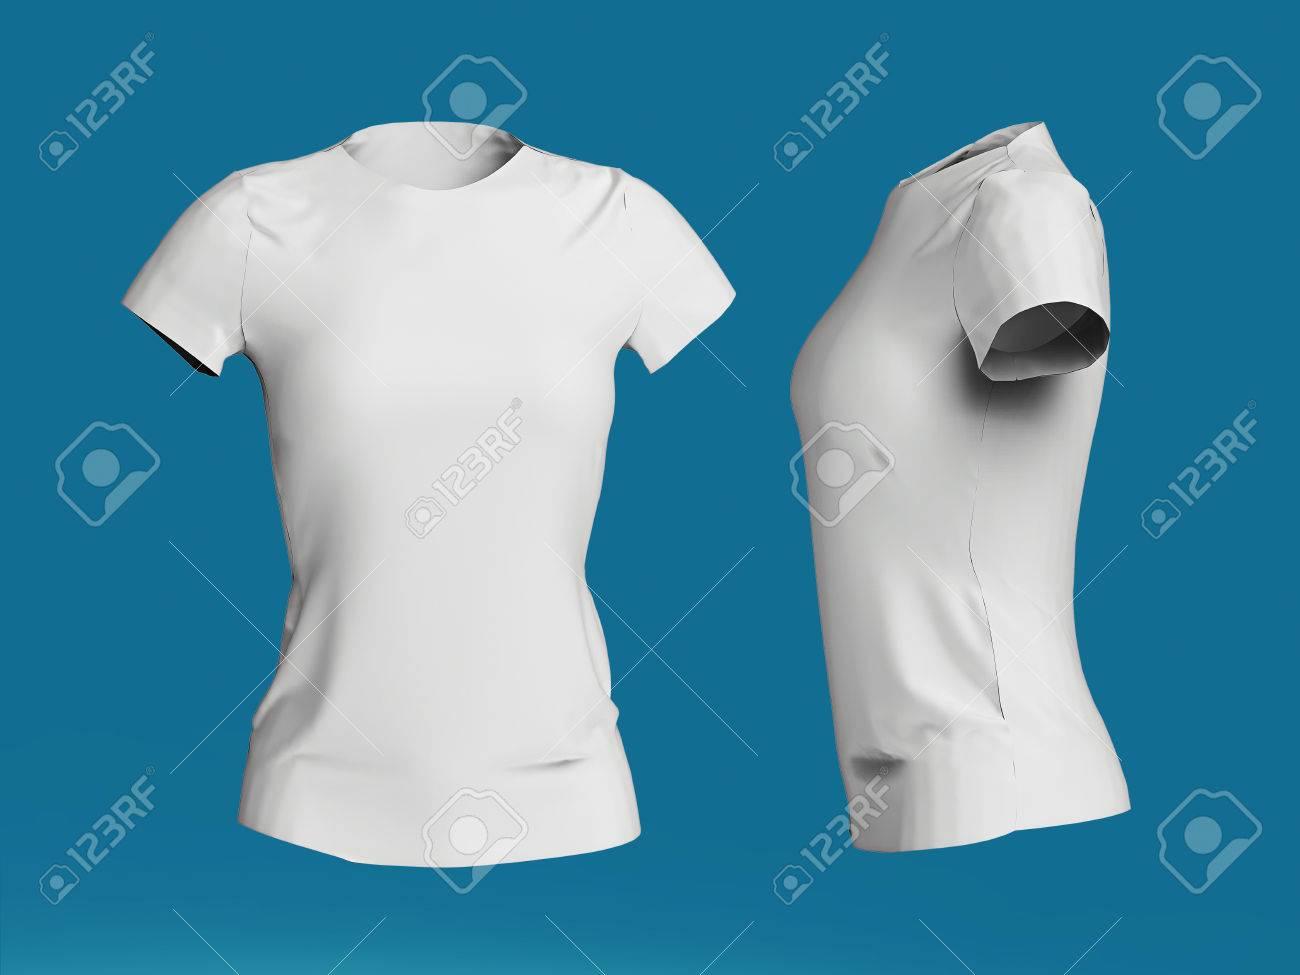 Blank Women T-shirt Template Isolated 3d Render.Promo Girls Uniform ...